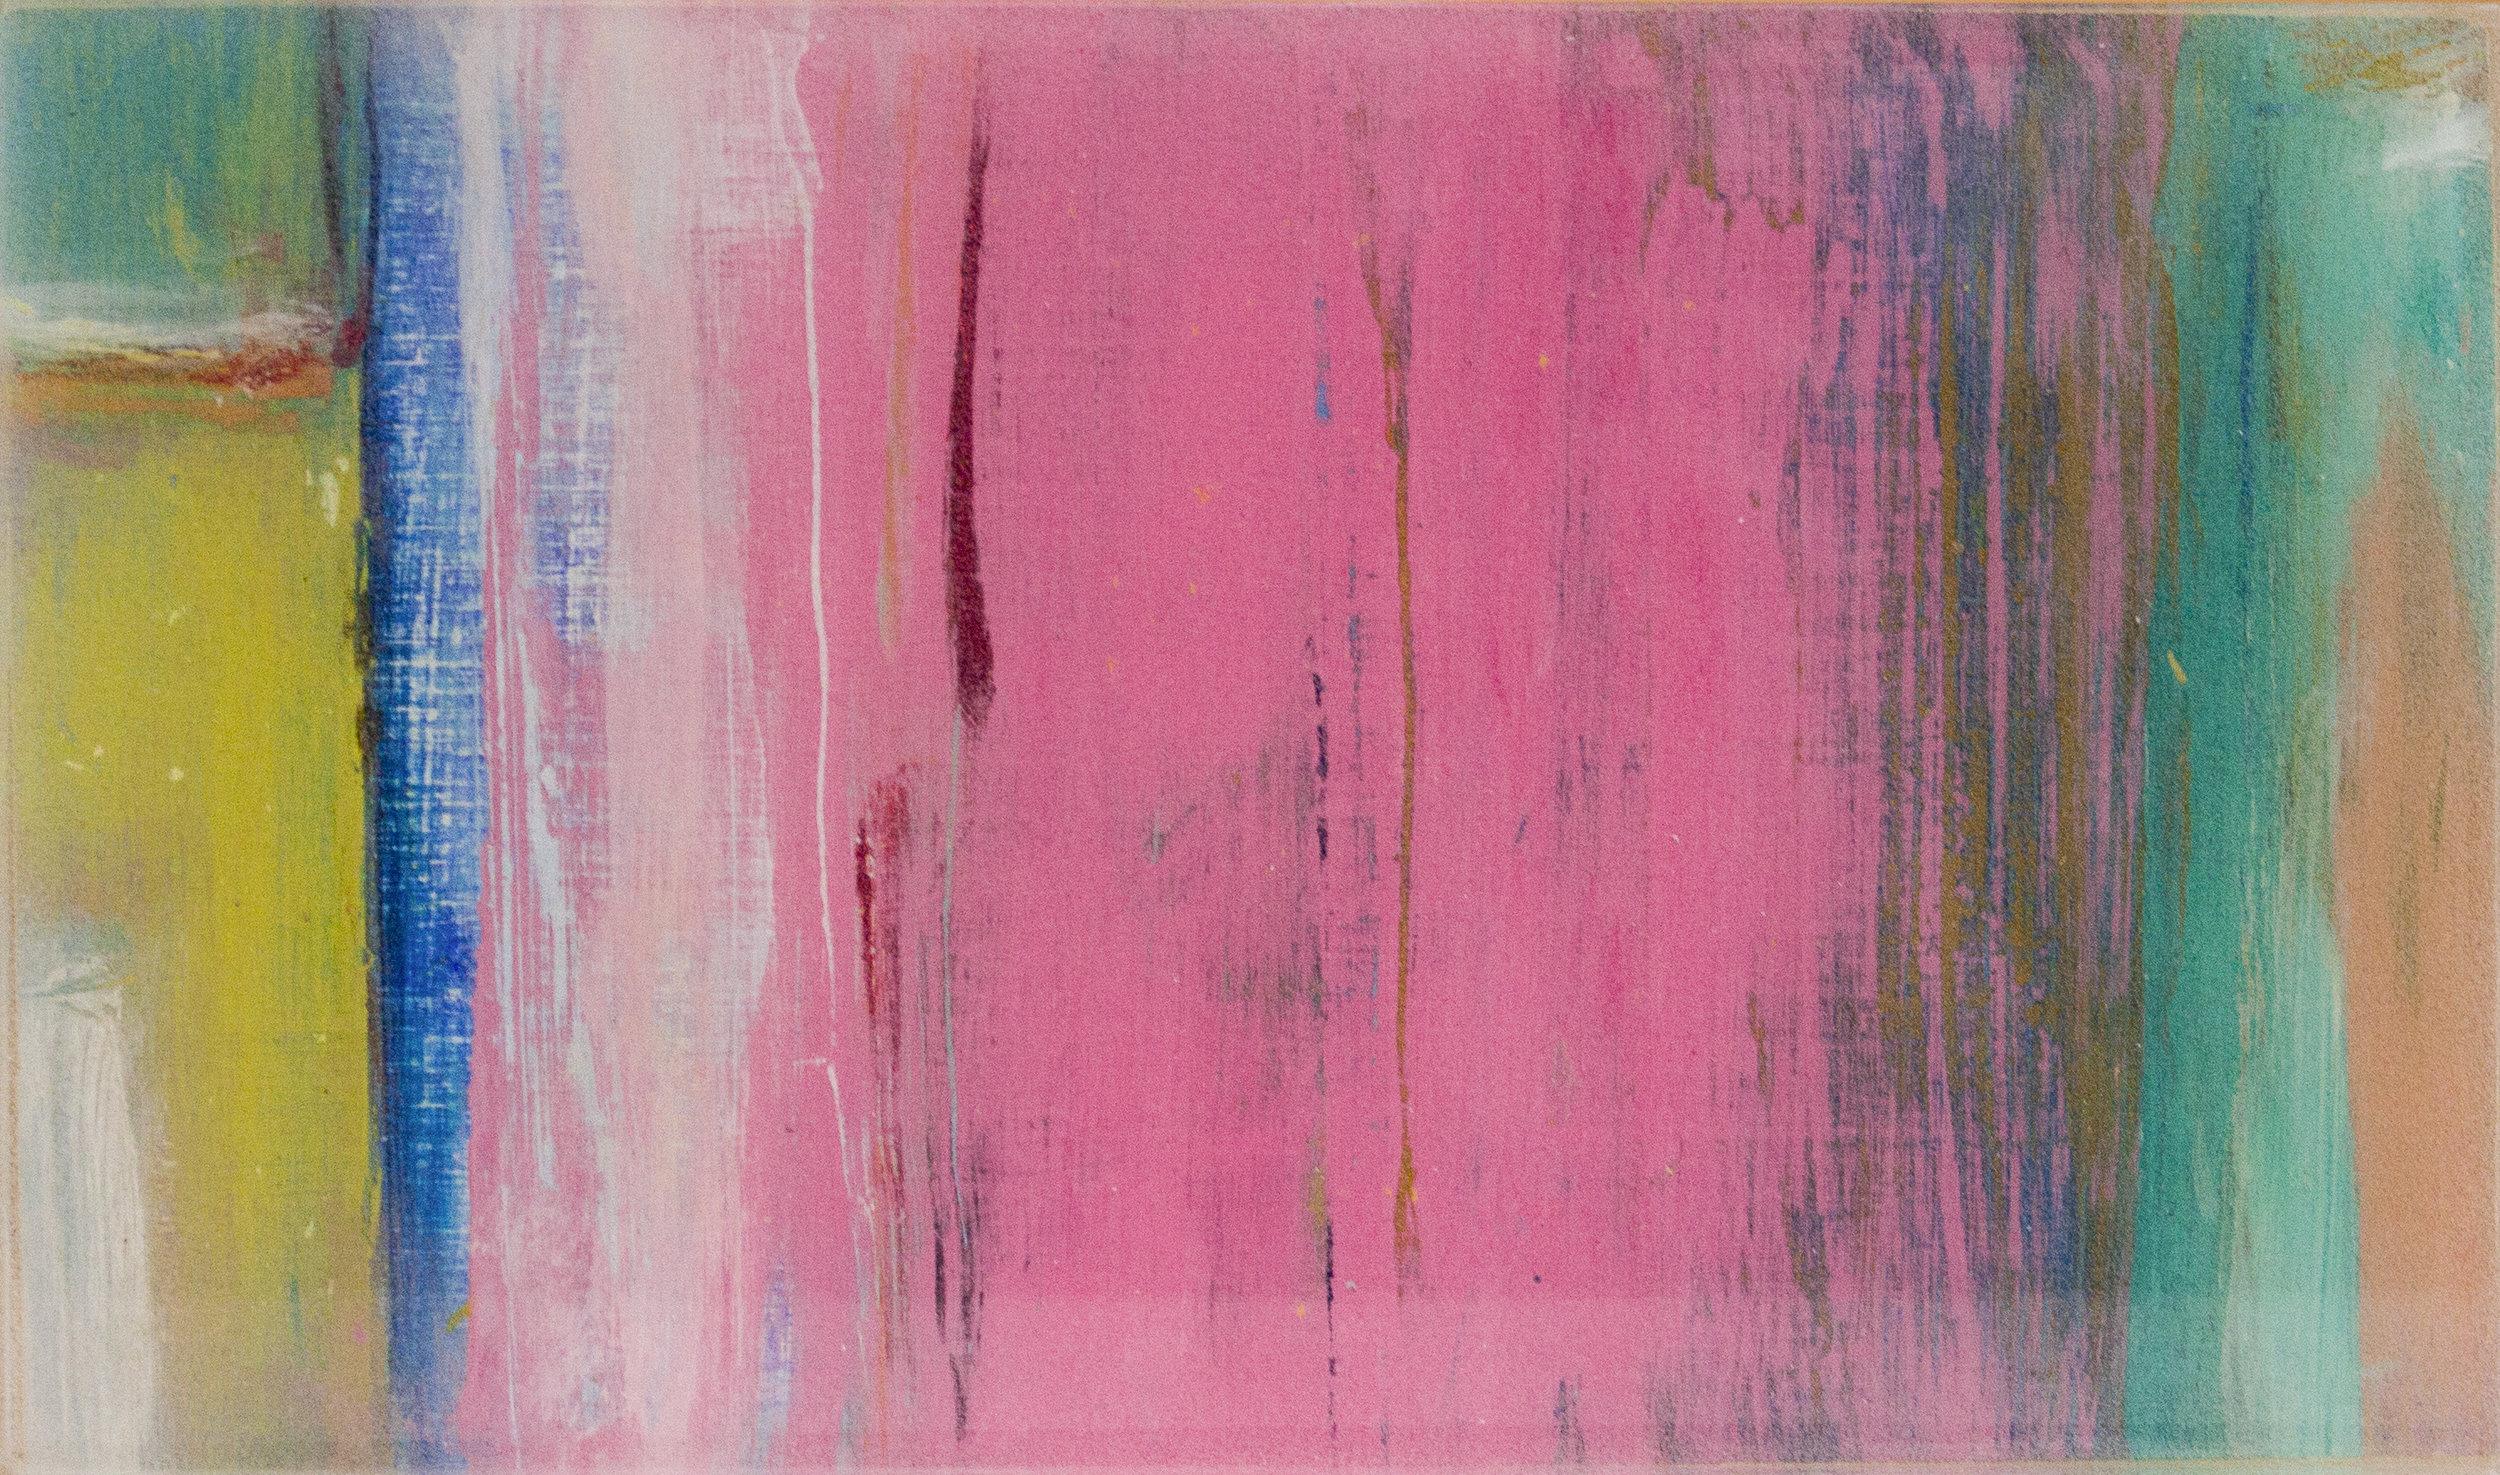 """Series #1: Color Compositions #17 Pink and Greens A,"" Matt Maher"